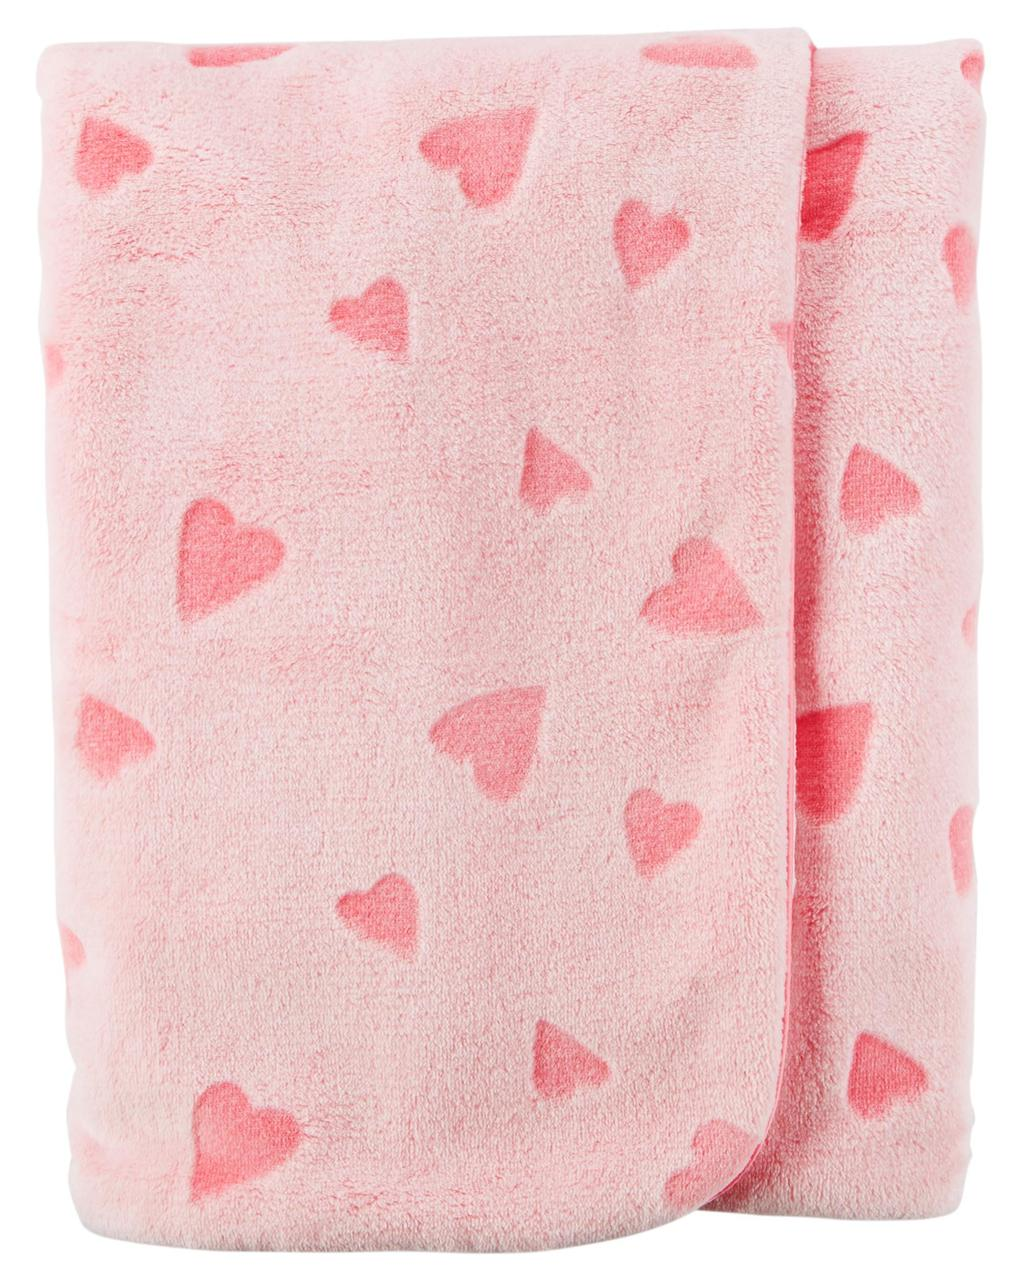 Теплый плюшевый плед для девочки Carters Сердечки Heart Plush Blanket